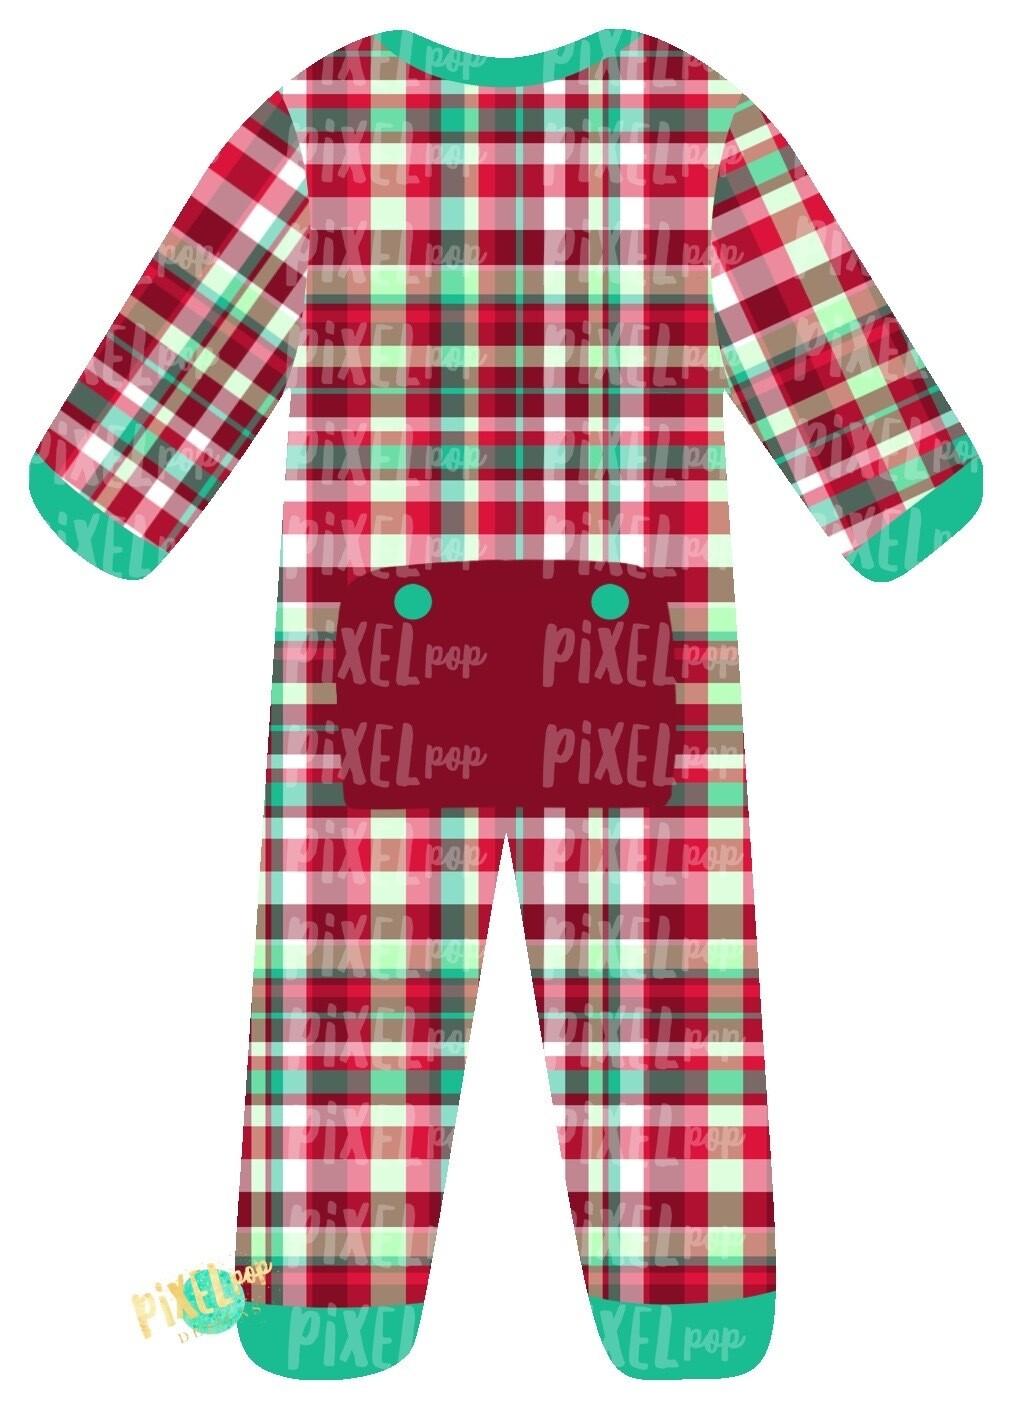 Christmas Plaid Bum Flap Pajama Ornament PNG | Christmas Pajama PNG | Christmas Pajamas Sublimation | Christmas Art | Christmas Clipart